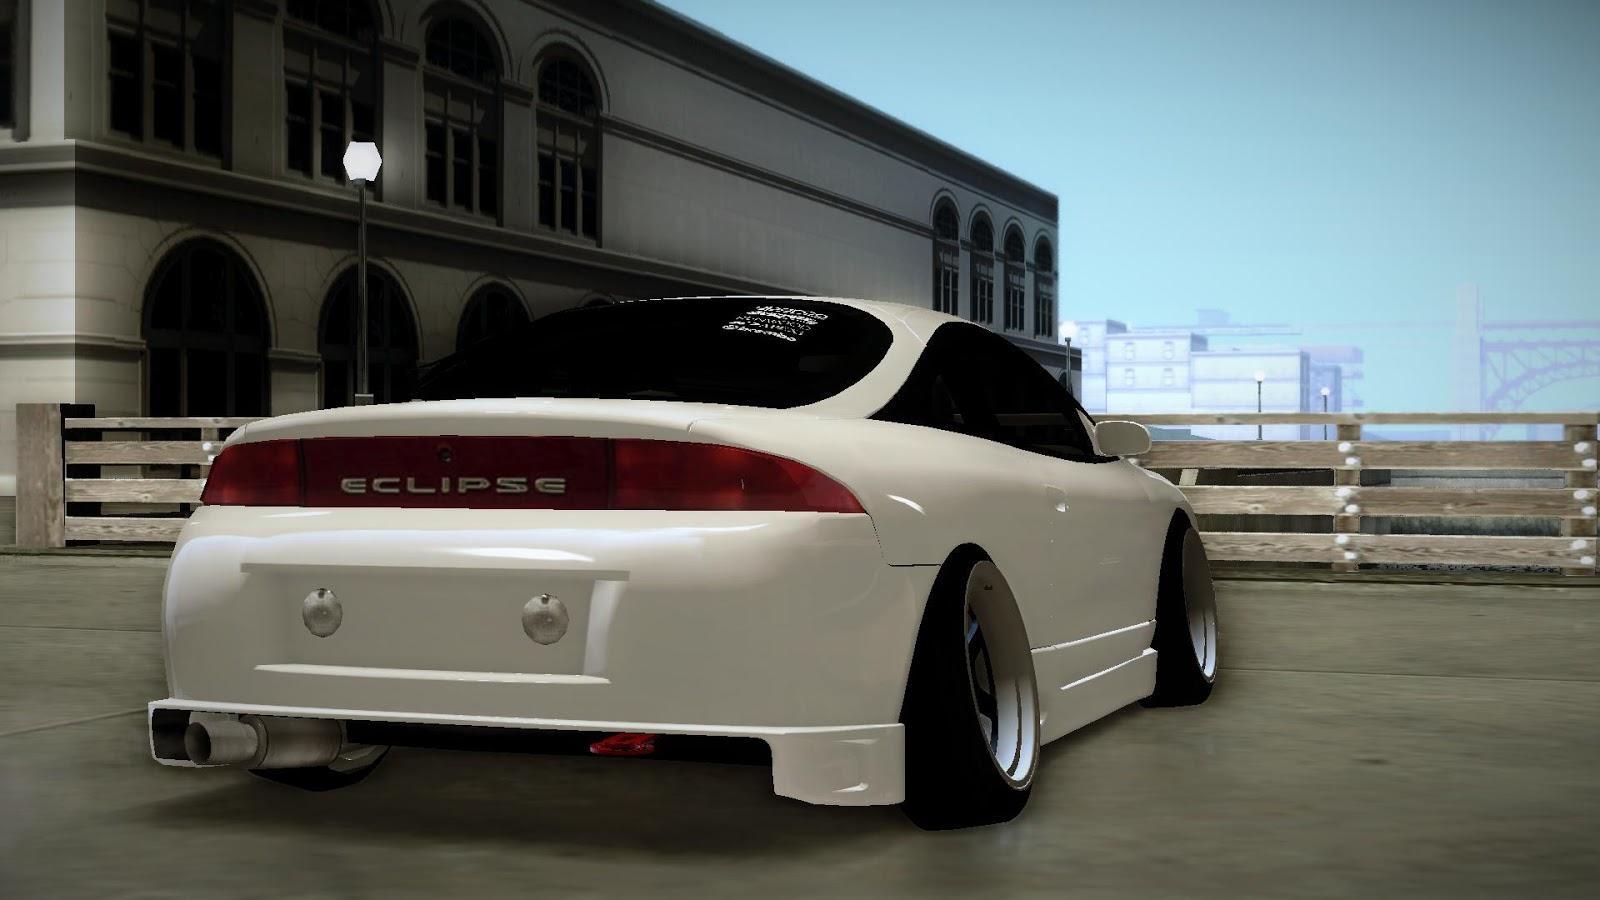 Mitsubishi Eclipse on Jdm Honda Civic 4 Door